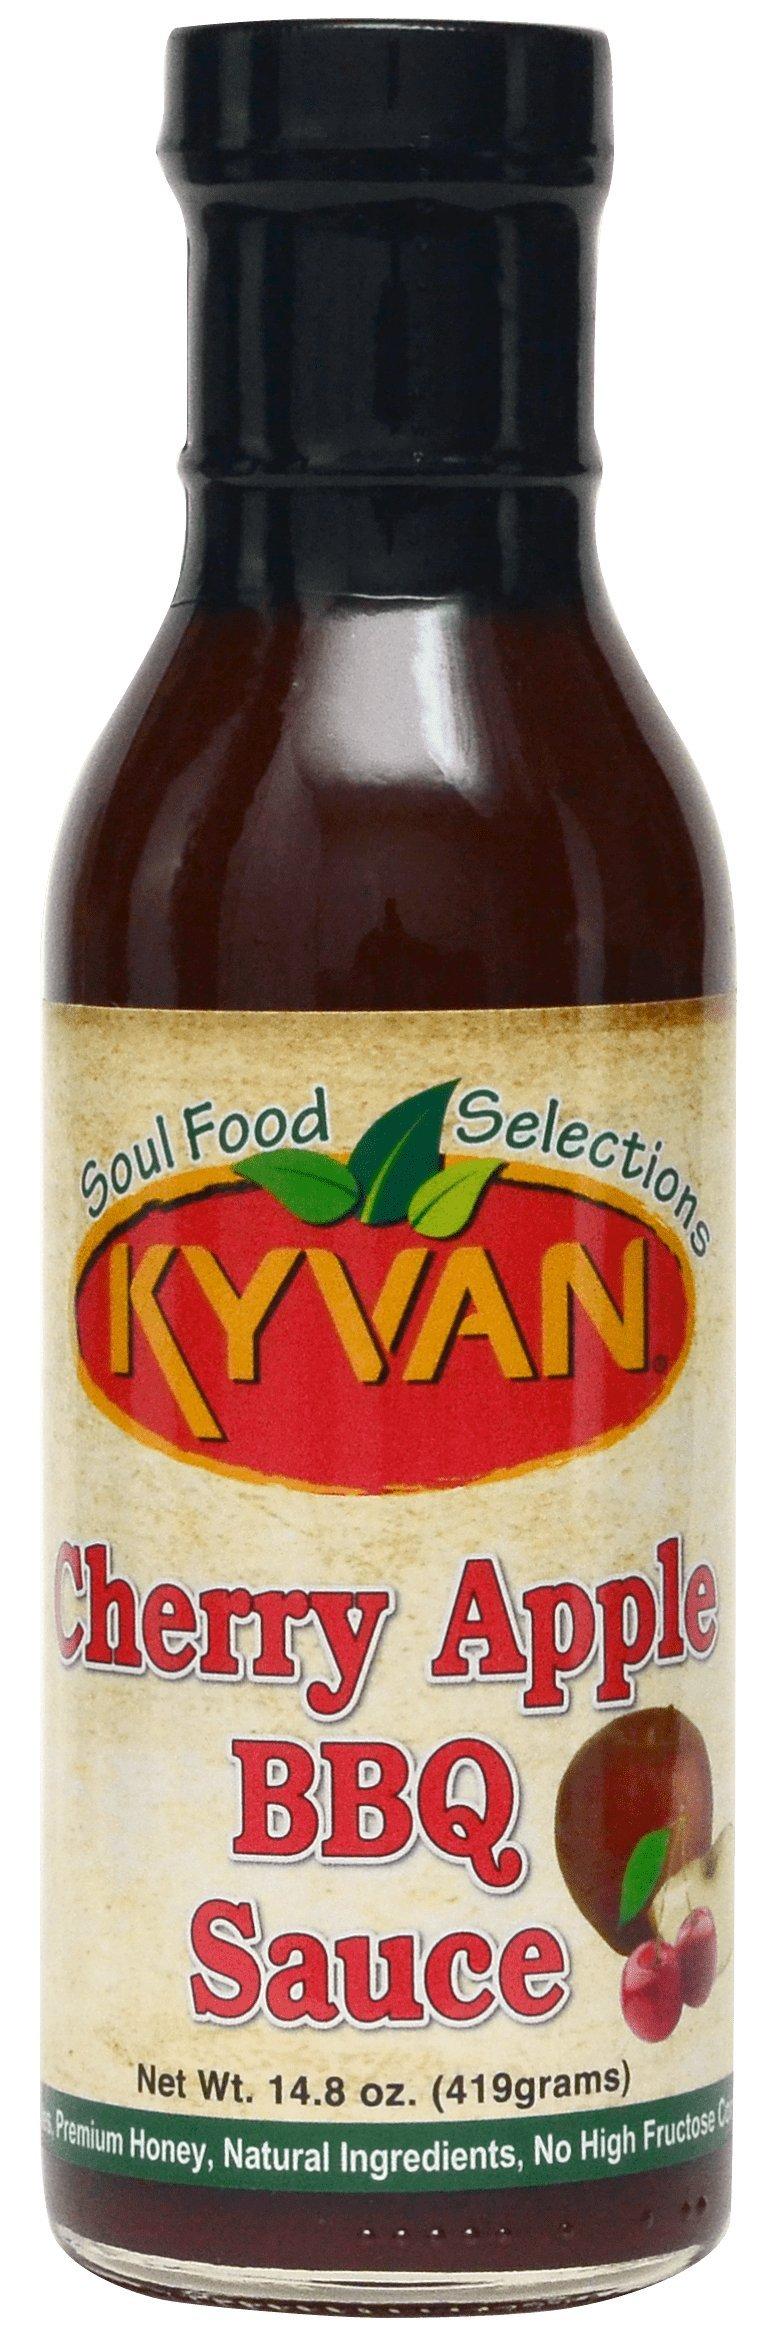 KYVAN Cherry Apple BBQ Sauce - 2 Pack